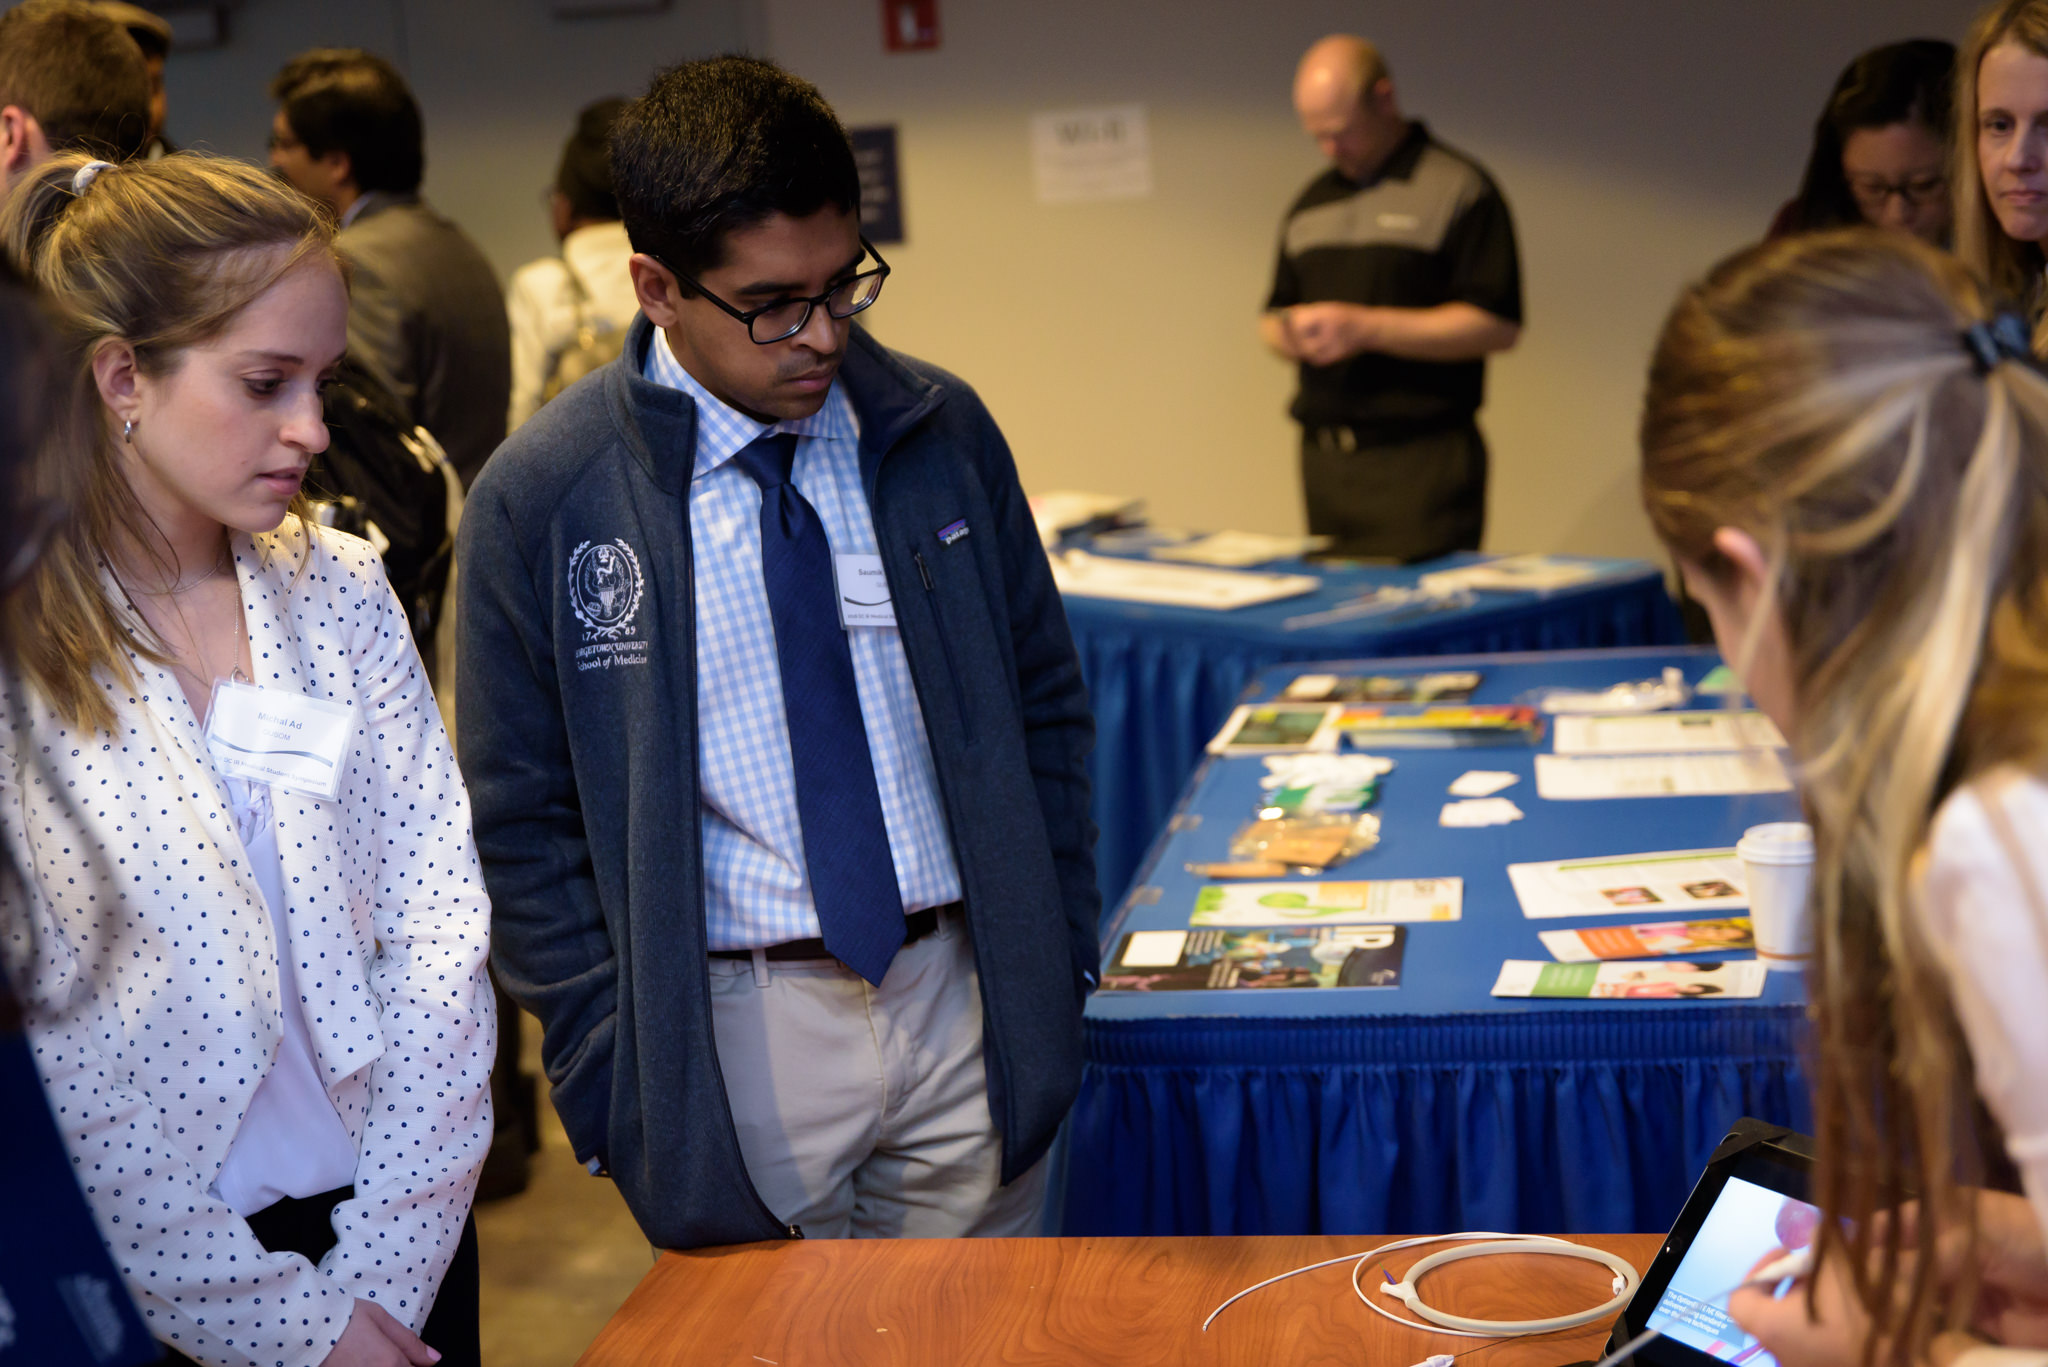 Symposium Planning Committee Members: Michal Ad (left, Georgetown) & Saumik Rahman (right, Georgetown)